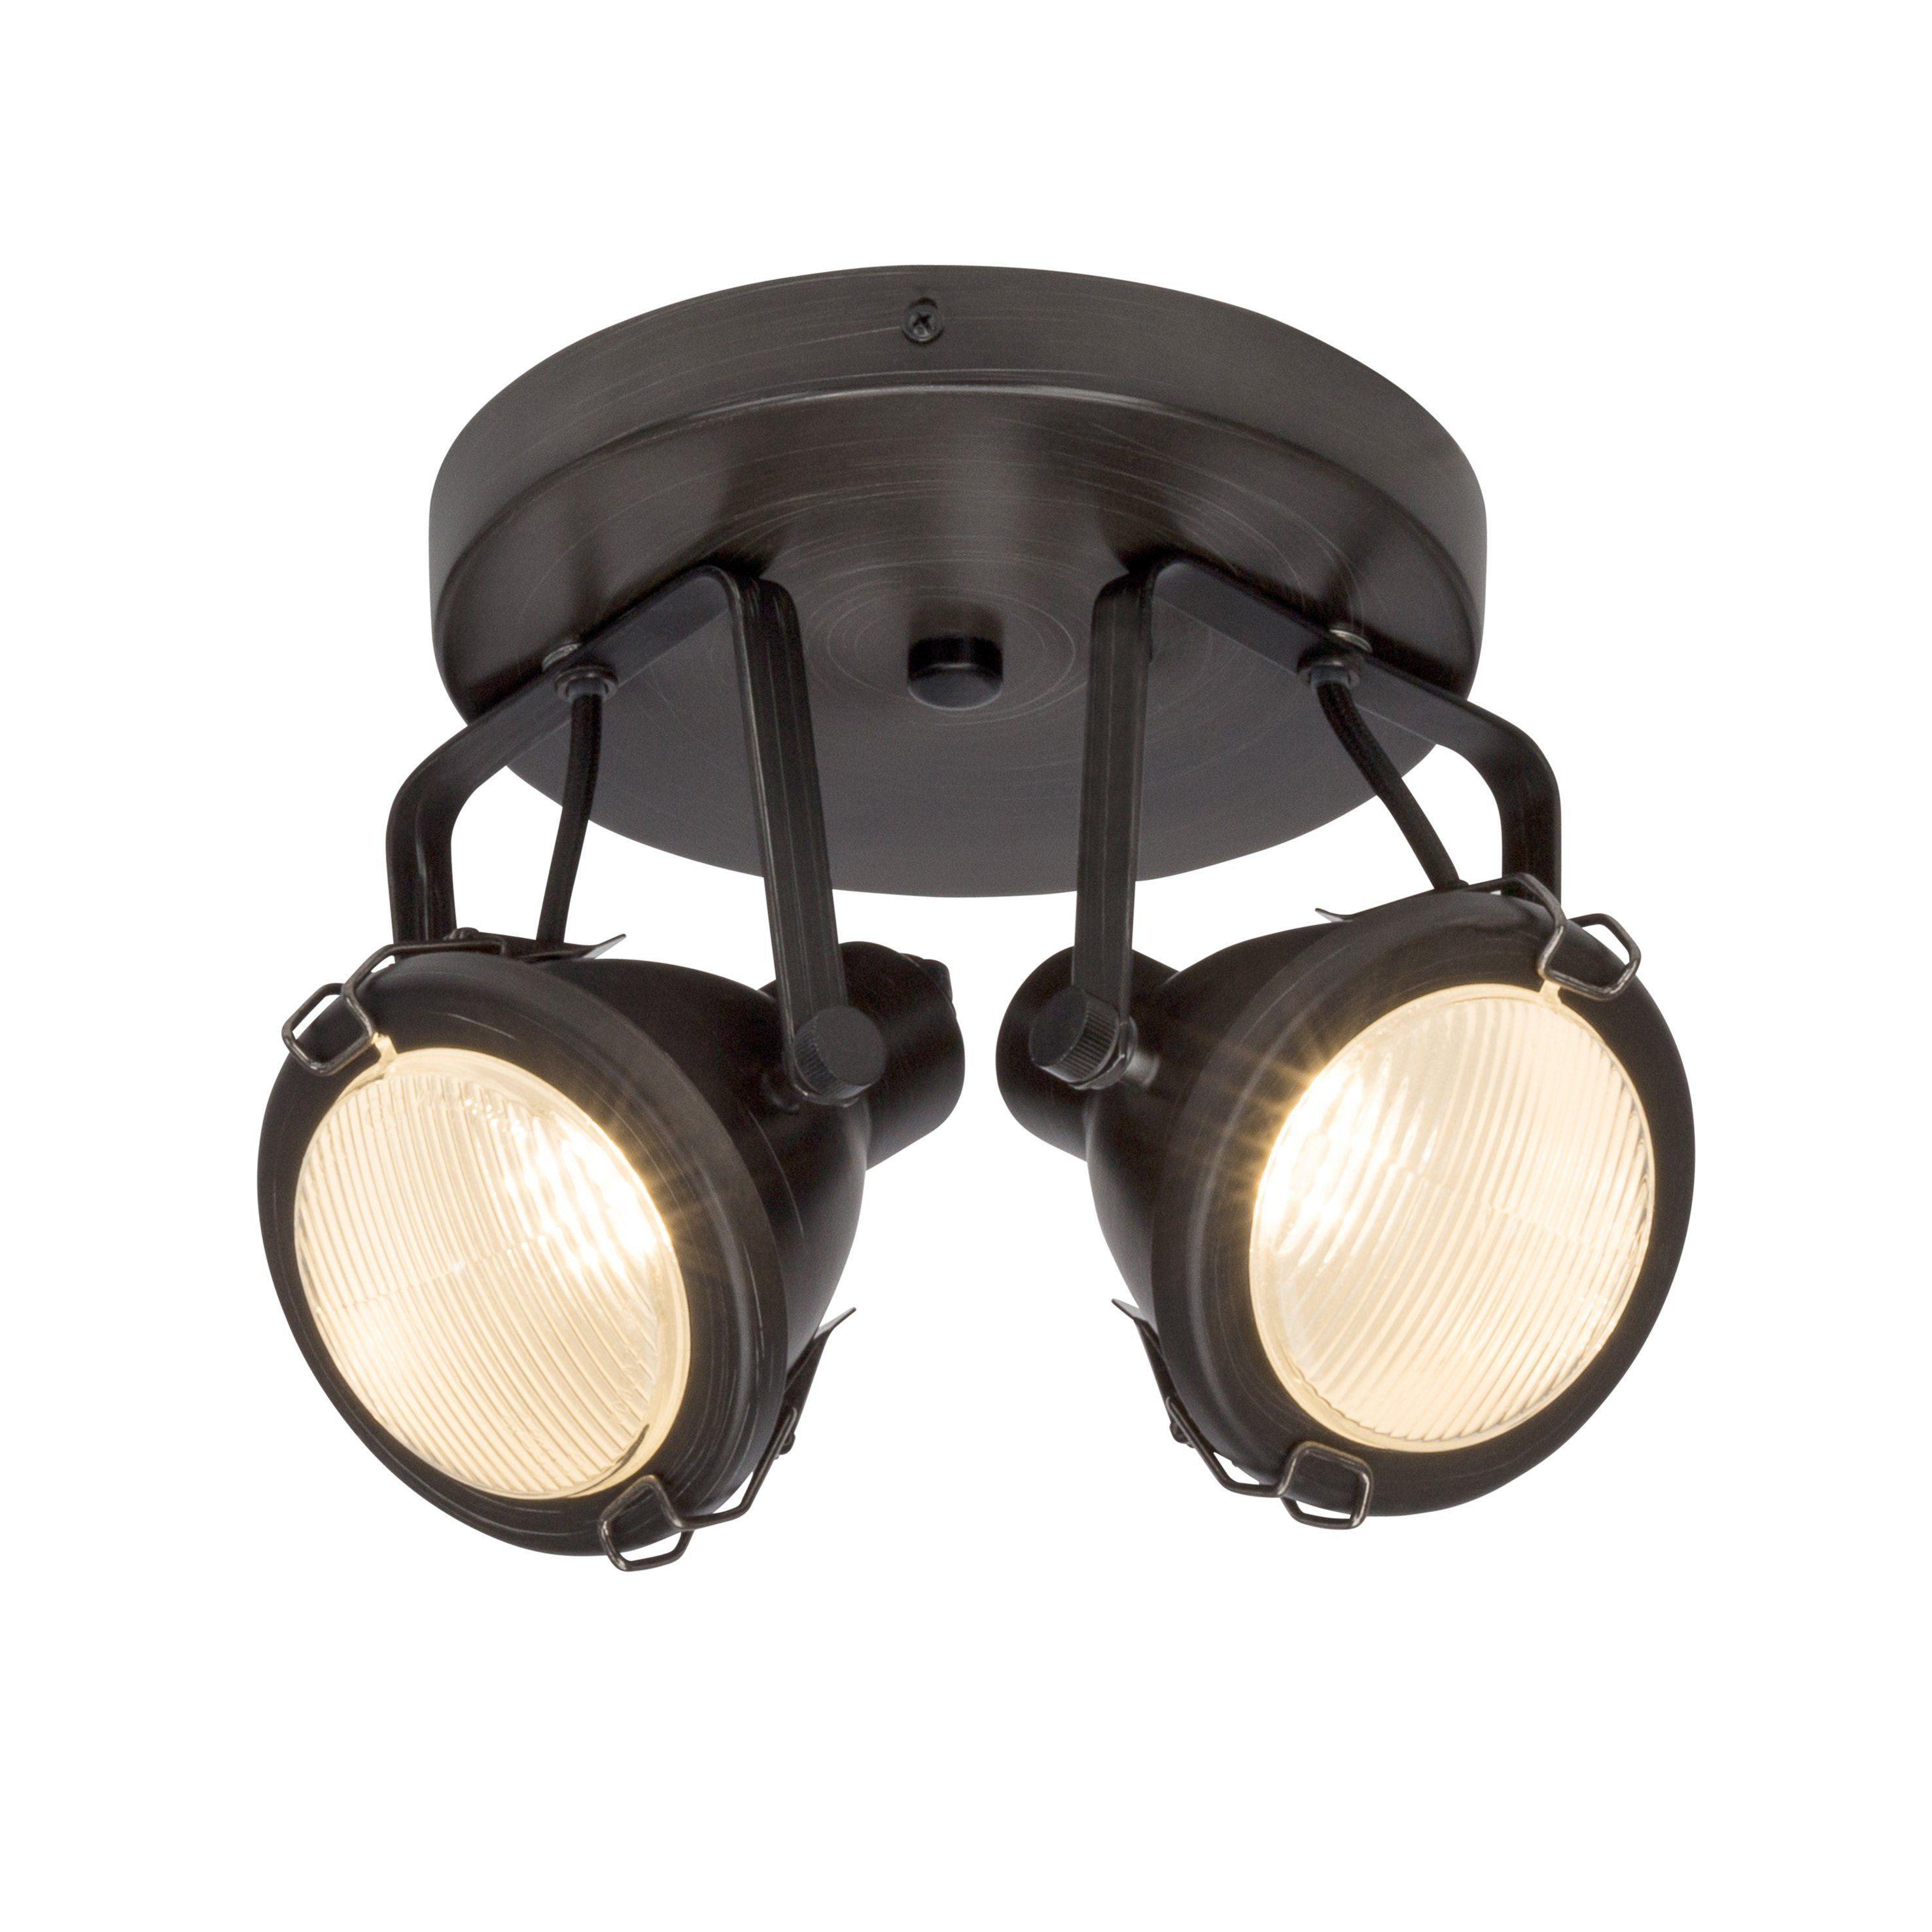 Brilliant Leuchten Bentli Spotspirale, 2-flammig antik/schwarz